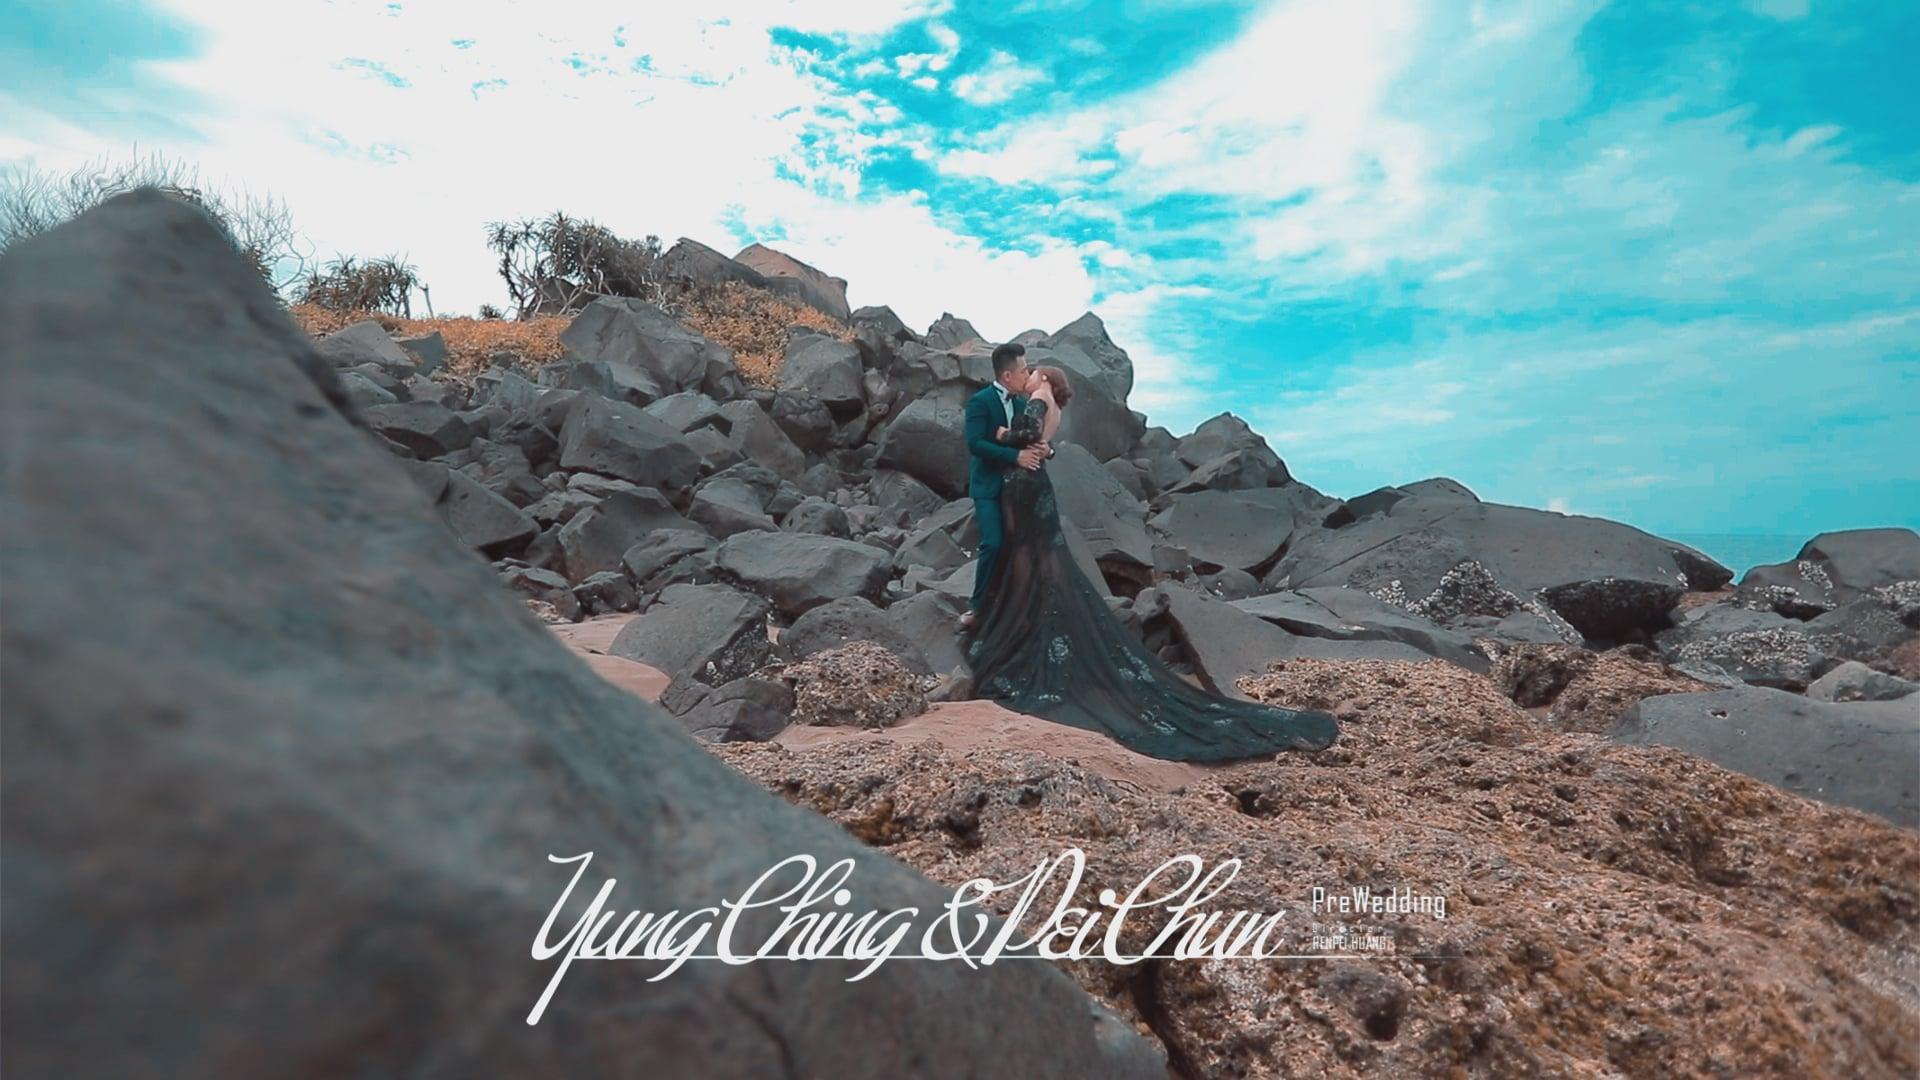 婚紗側錄(Yung Ching+Pei Chun)